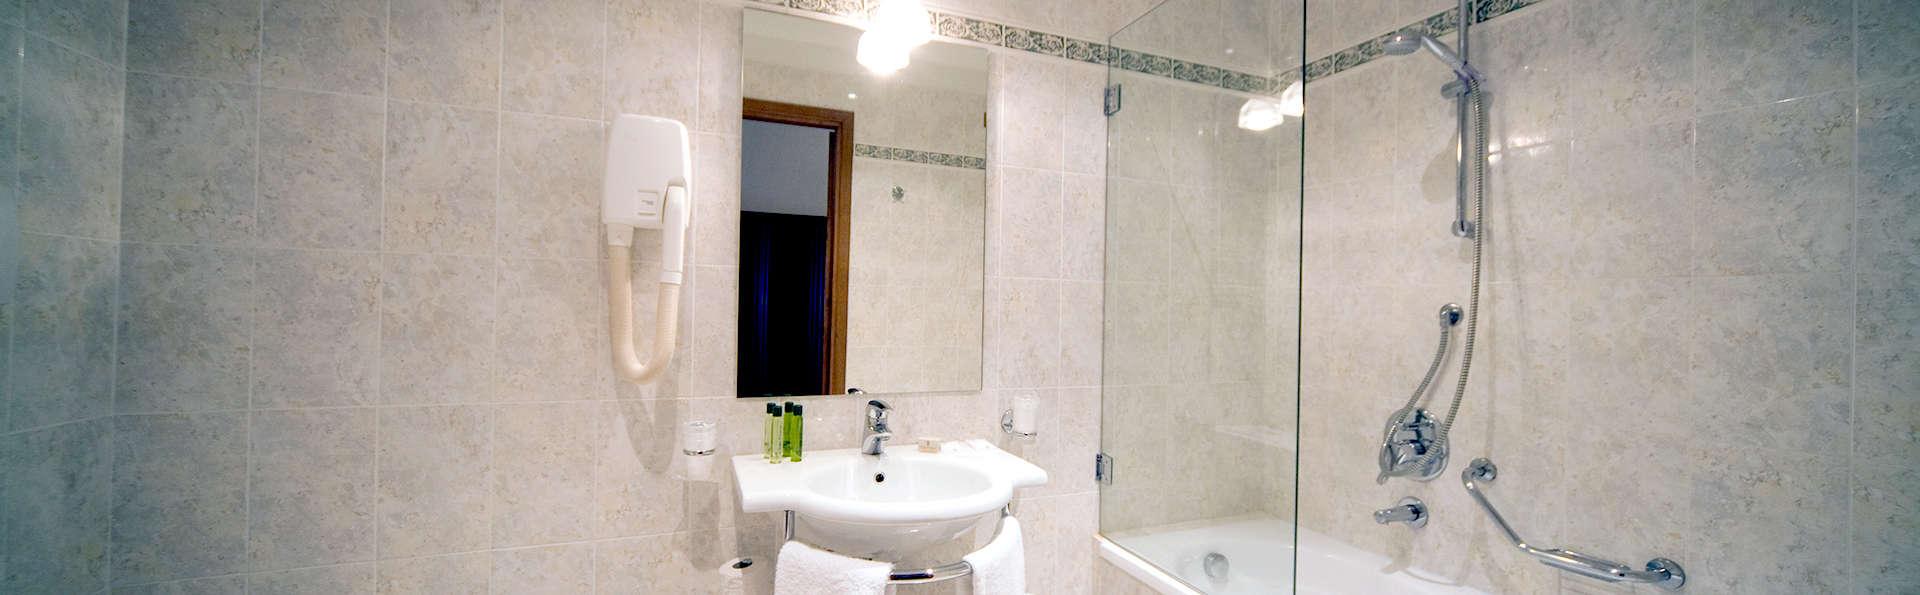 Villa Pitiana - Edit_Bathroom.jpg